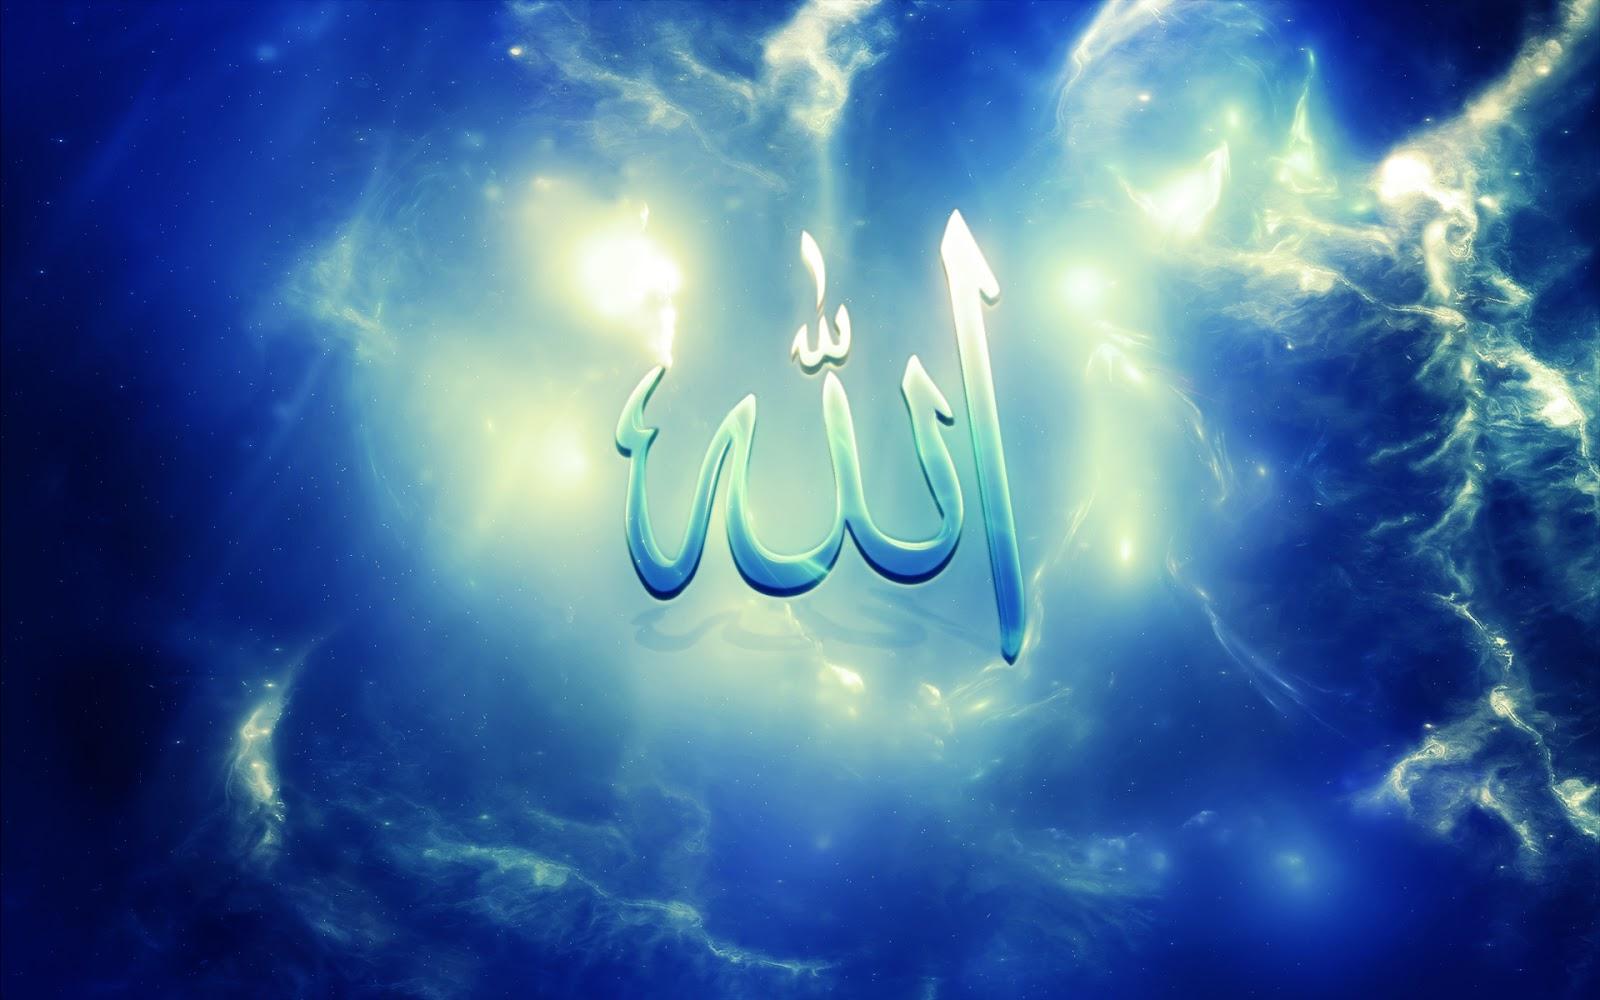 Allah Name wallpapers HD Islamic Wallpapers 1600x1000